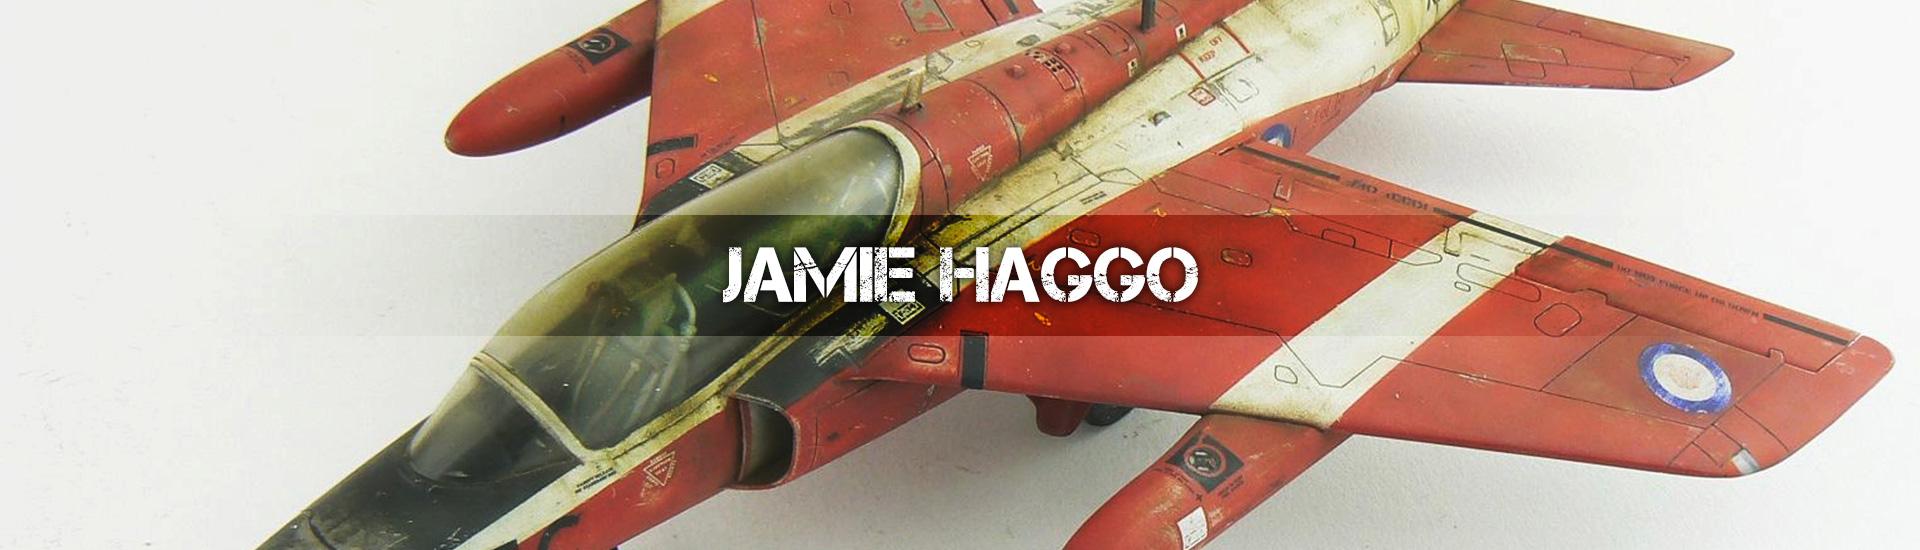 Jamie_Haggo_Main